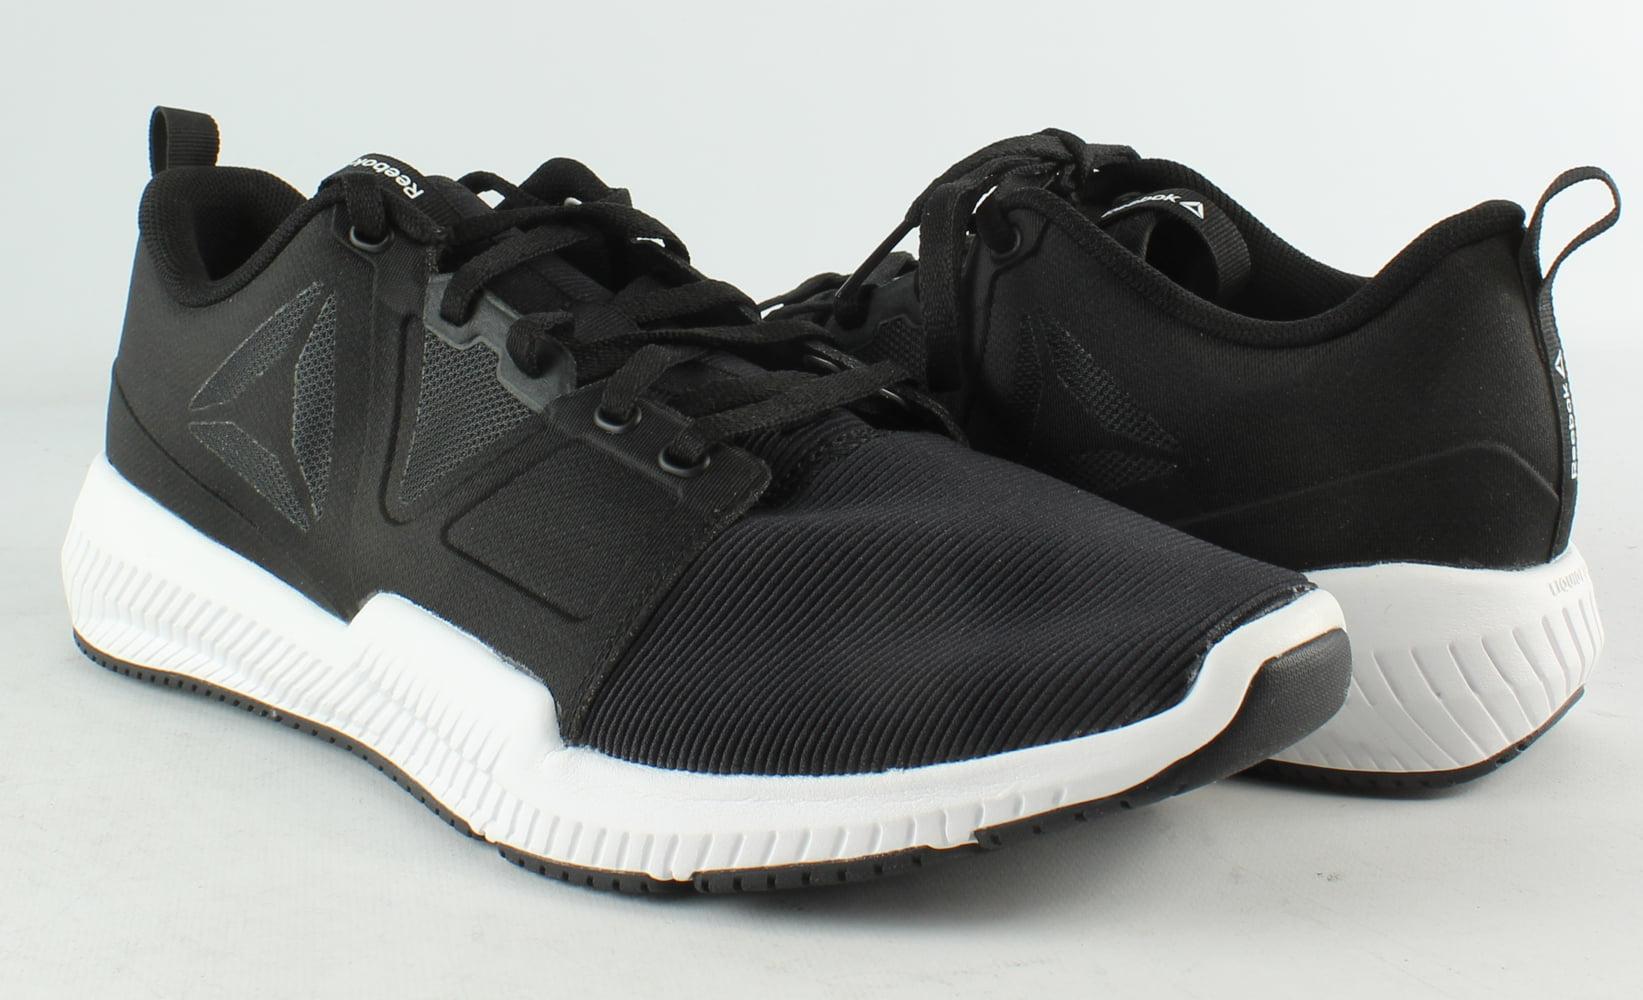 3d6d65182203 Reebok - Reebok Mens HYDRORUSH TR Black White Cross Training Shoes Size 8  New - Walmart.com